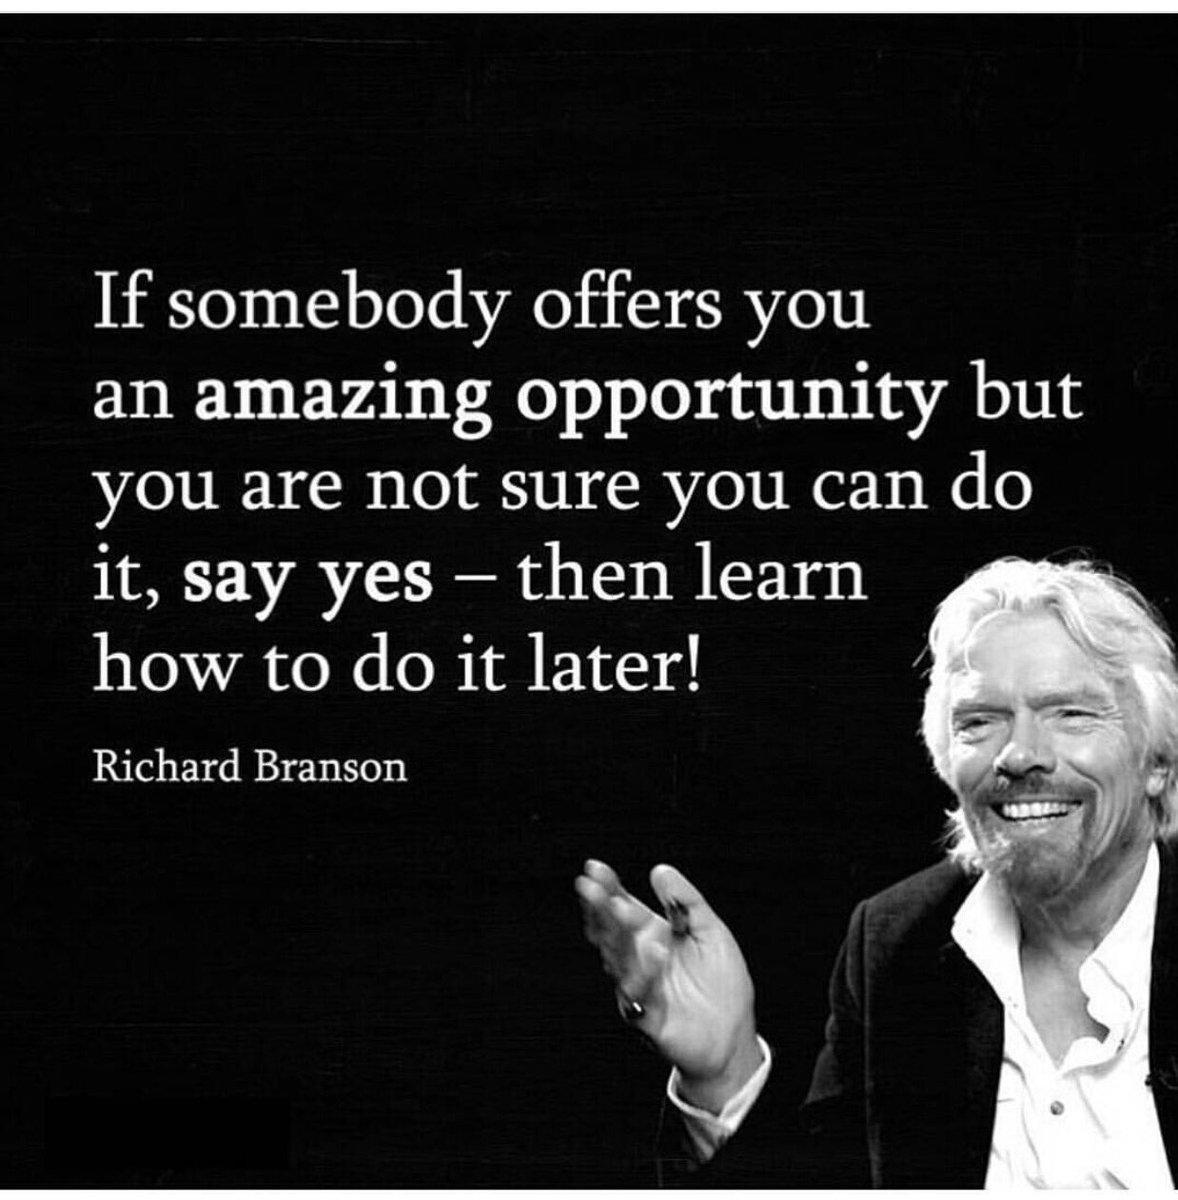 If Someone Offers You An Amazing Opportunity... @10MillionMiler #entrepeneur #Leadership RT @richardbranson @foundr https://t.co/BzhjOU0rcX